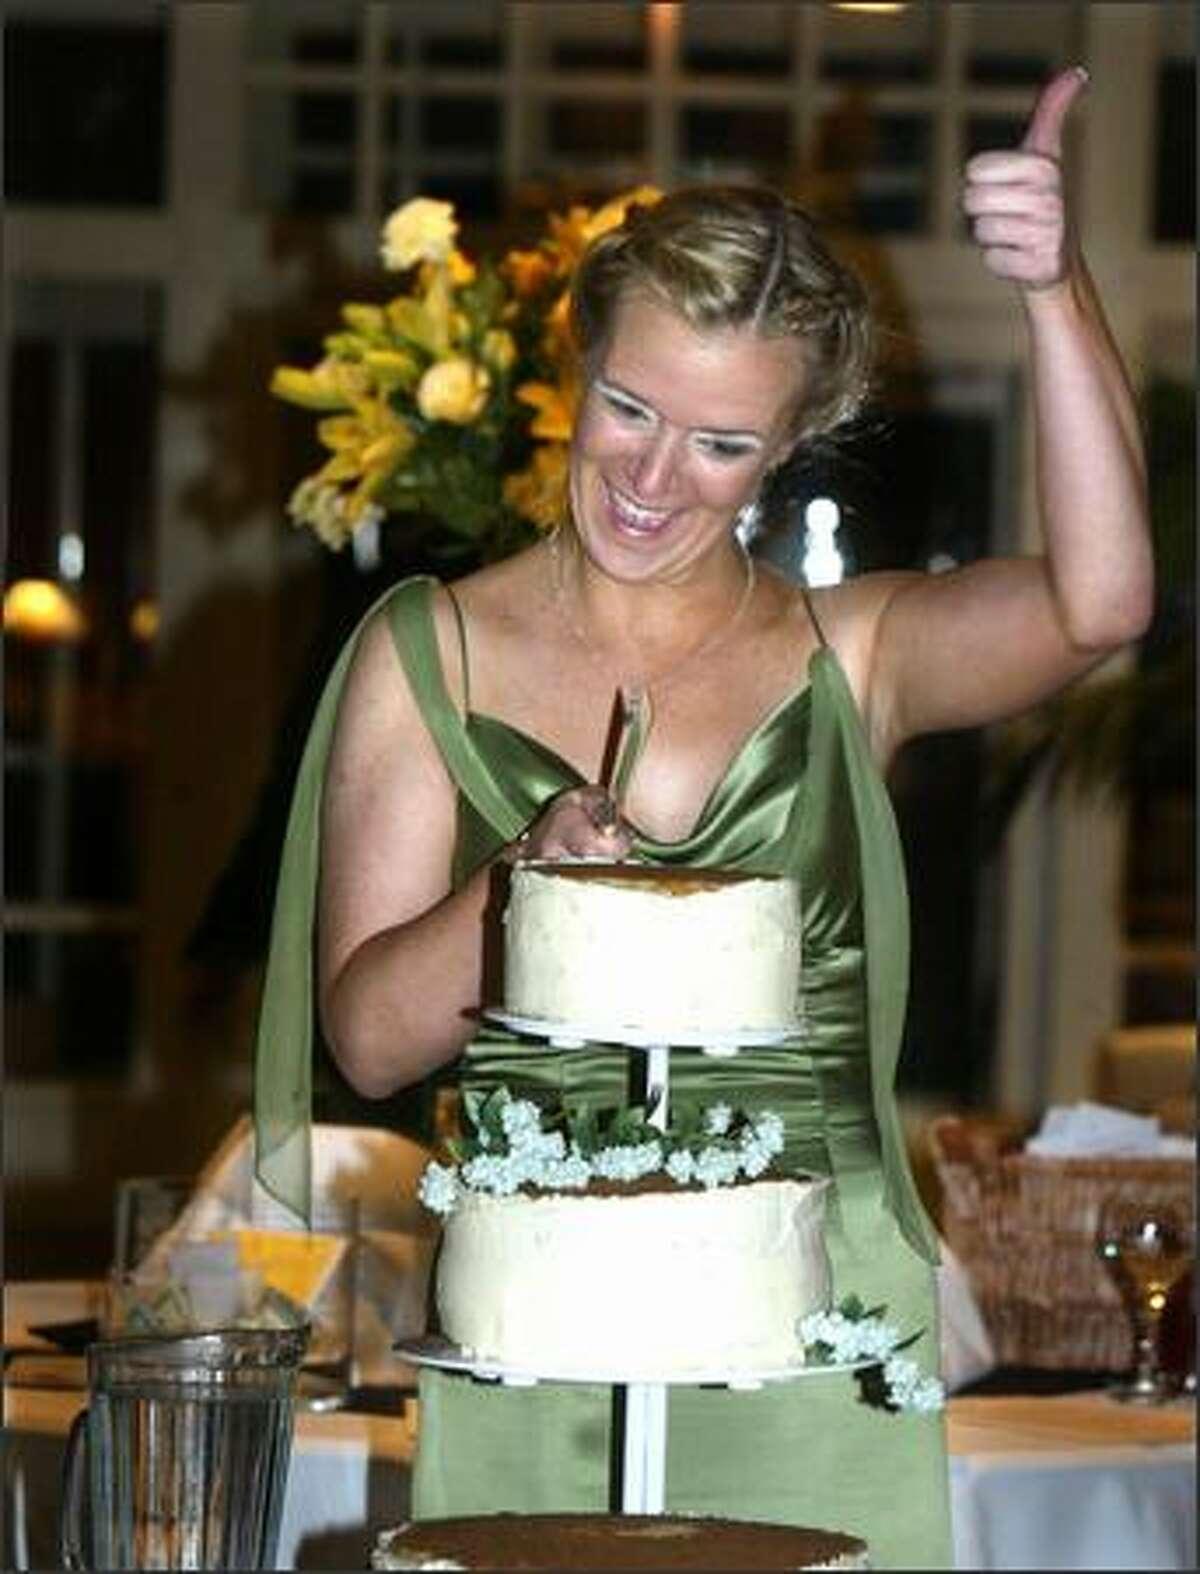 An upside down lemon-frosted wedding cake goes under Schultz's knife.